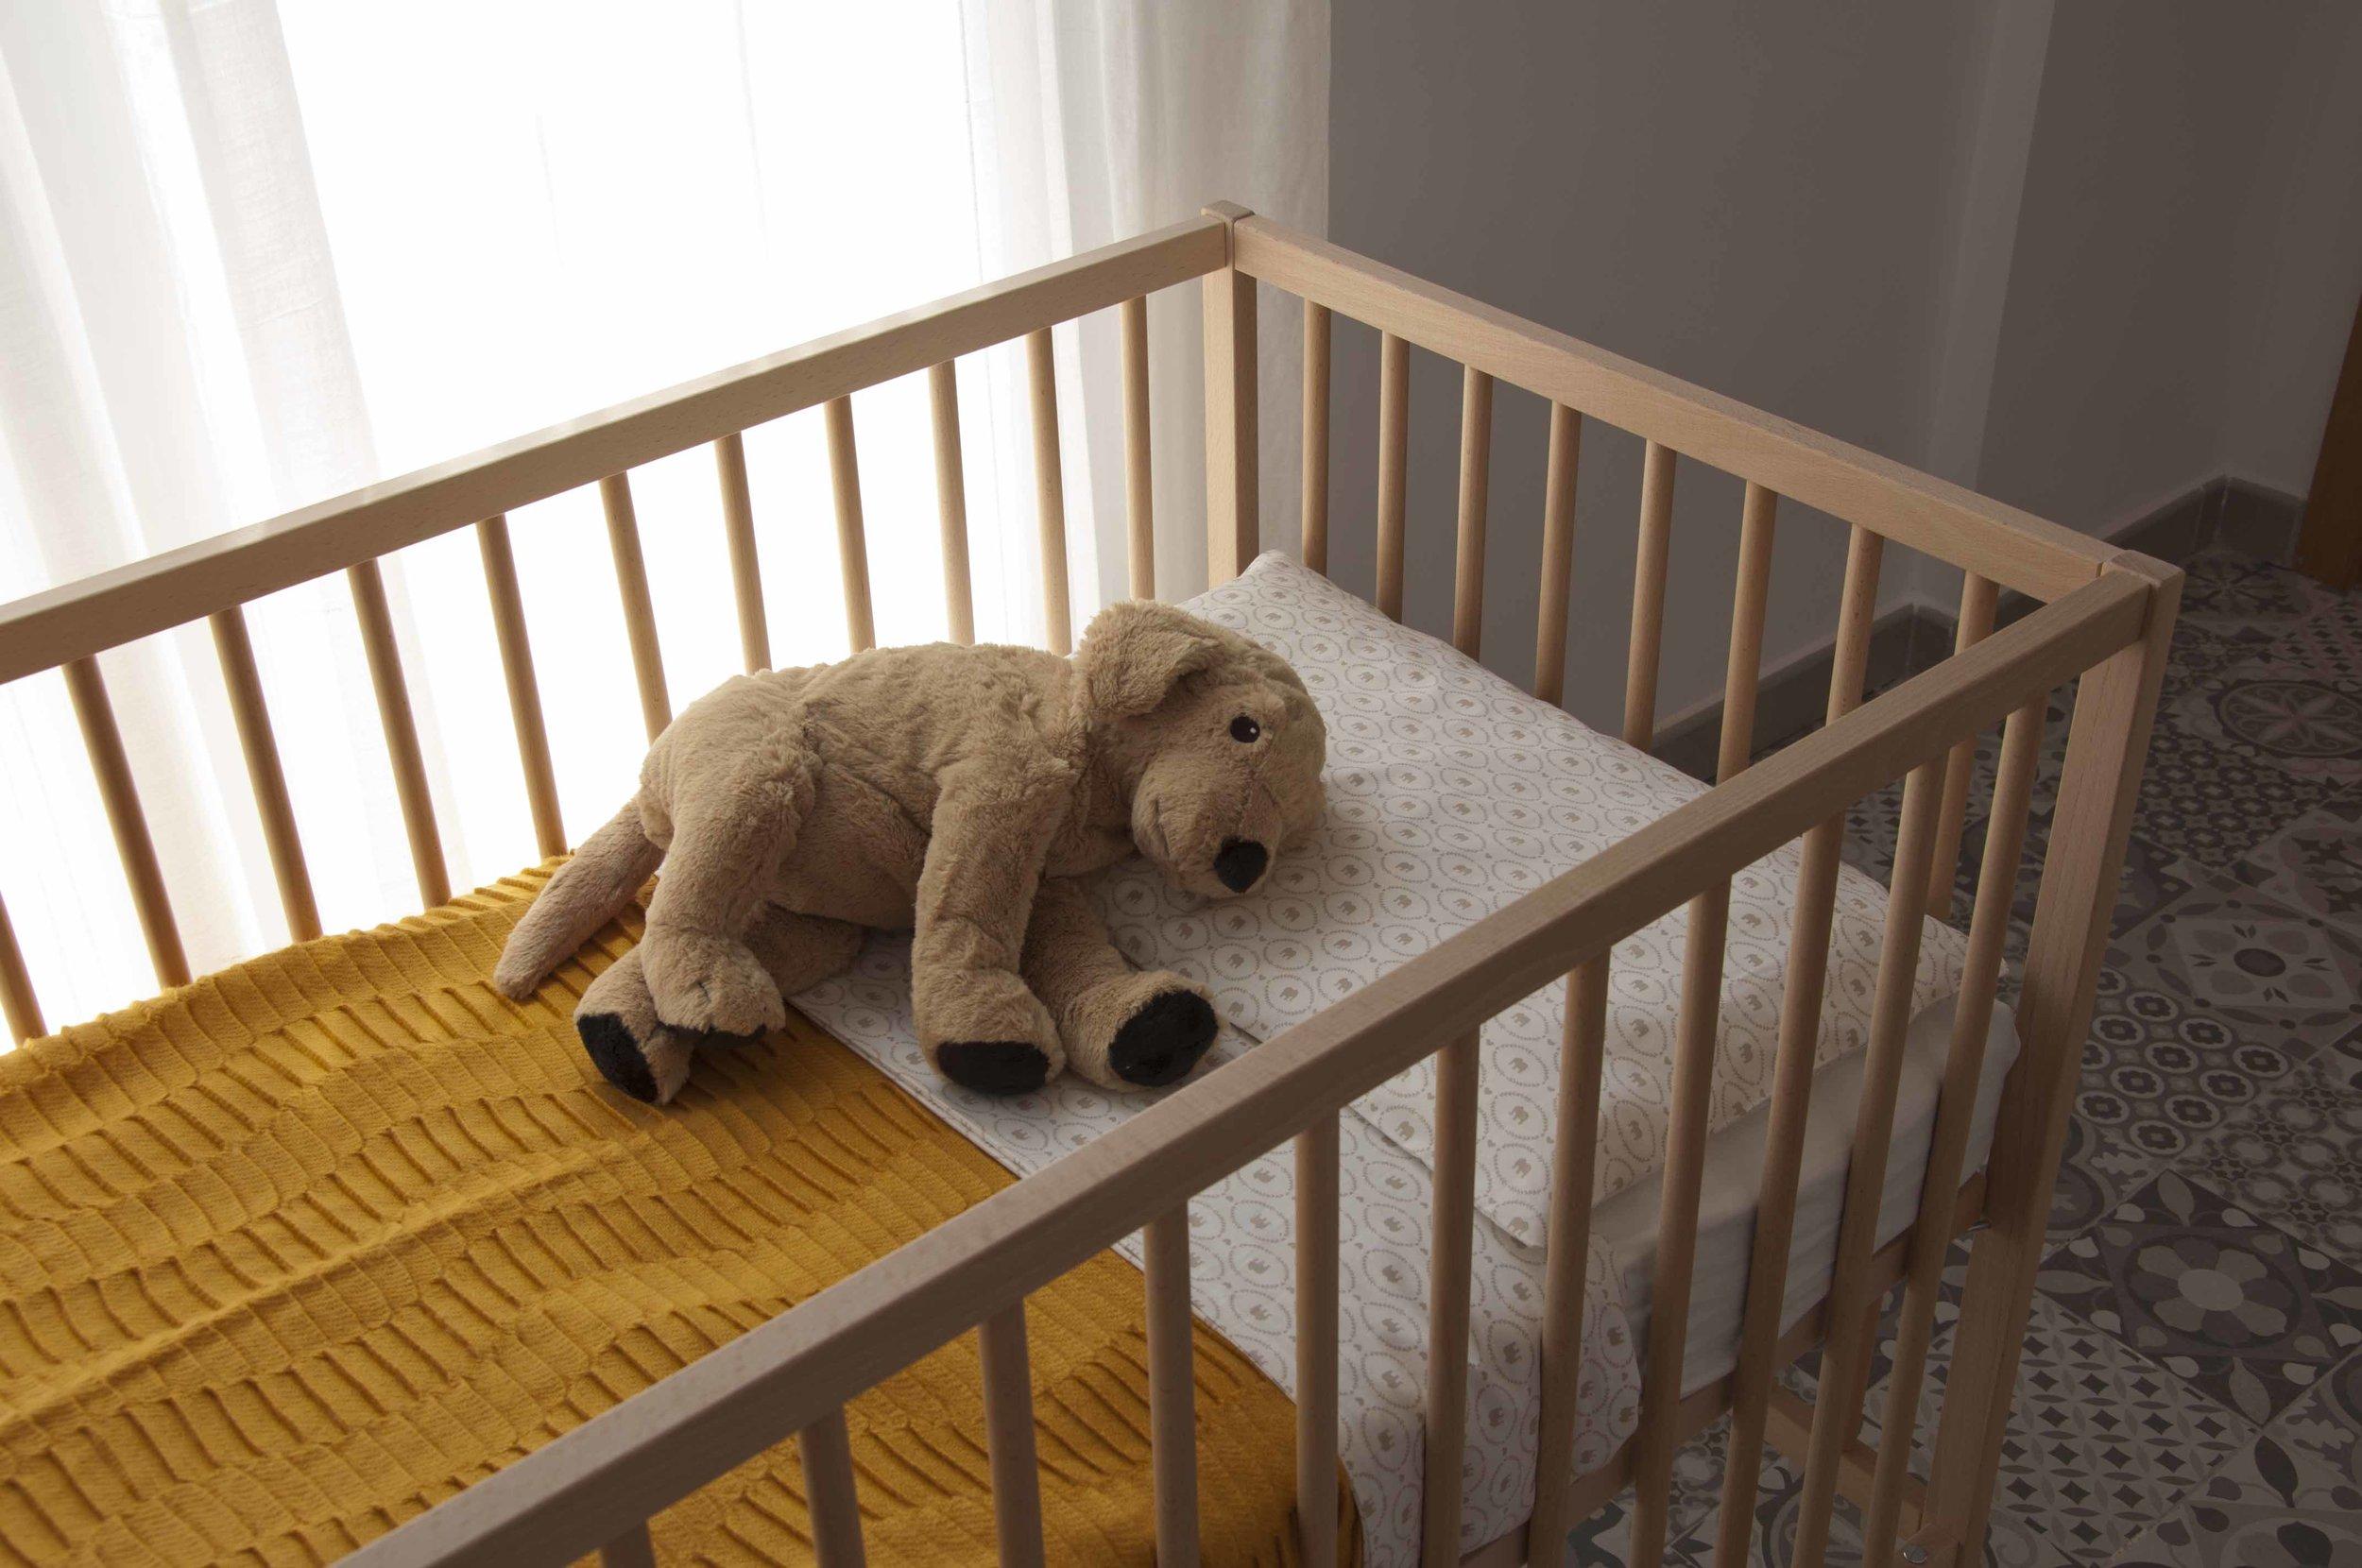 baby crib at Zalamera B&B in Valencia, Spain.jpg